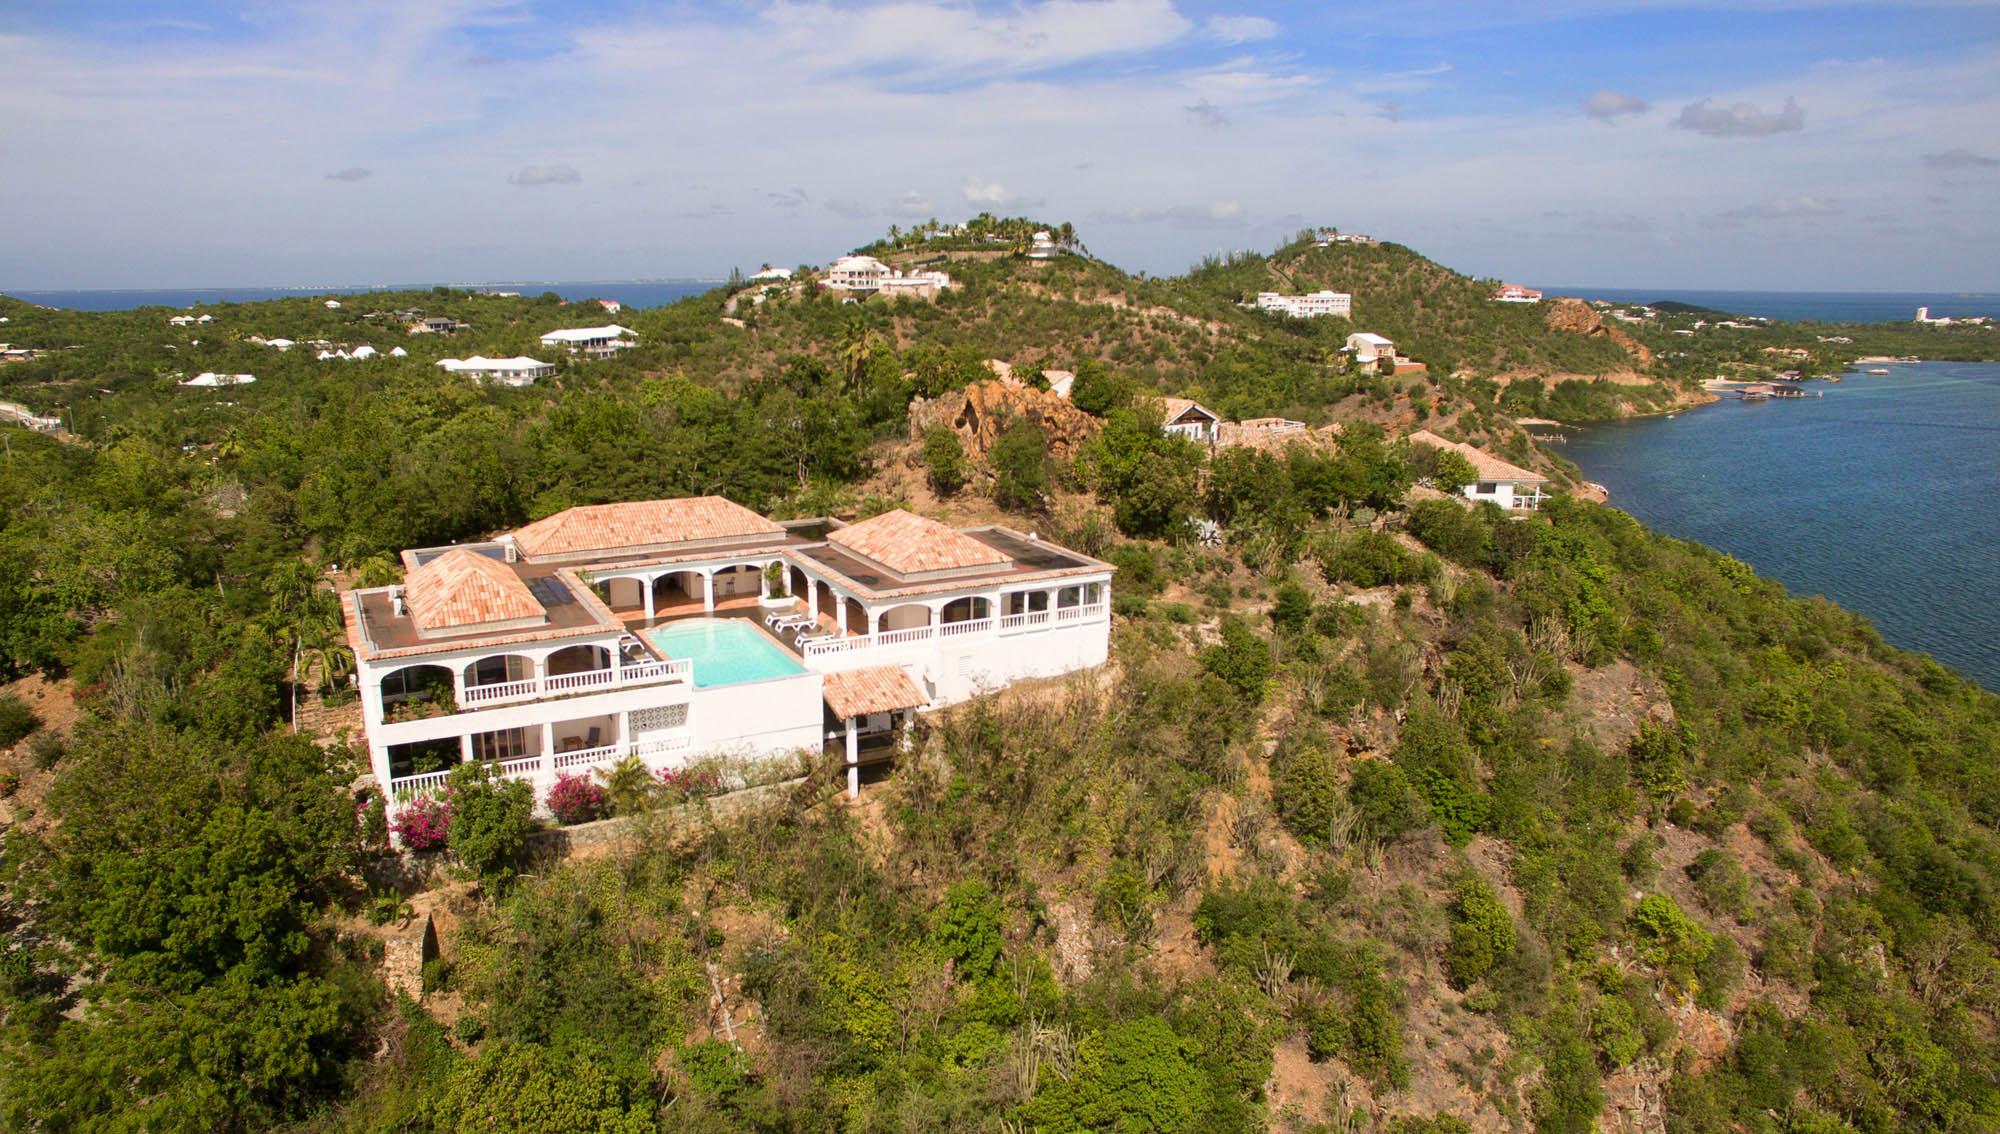 An aerial photograph of Escapade villa rental, Anse au Cajoux, Terres-Basses, Saint Martin, Caribbean.